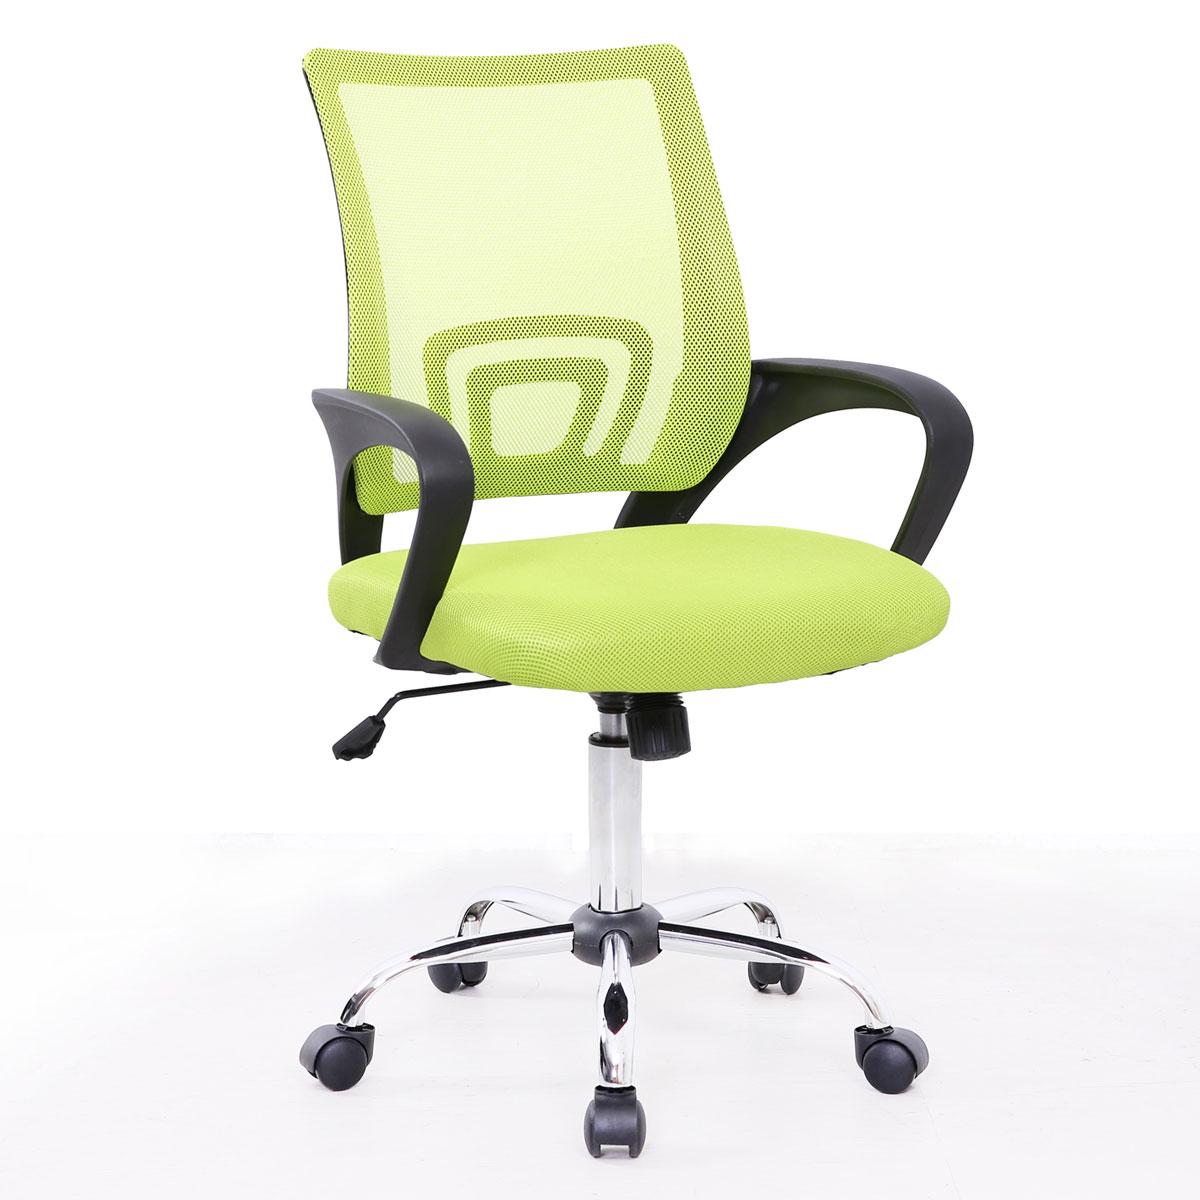 b rostuhl drehstuhl arbeitsstuhl rollen seat stuhl stoff schreibtischstuhl netz ebay. Black Bedroom Furniture Sets. Home Design Ideas